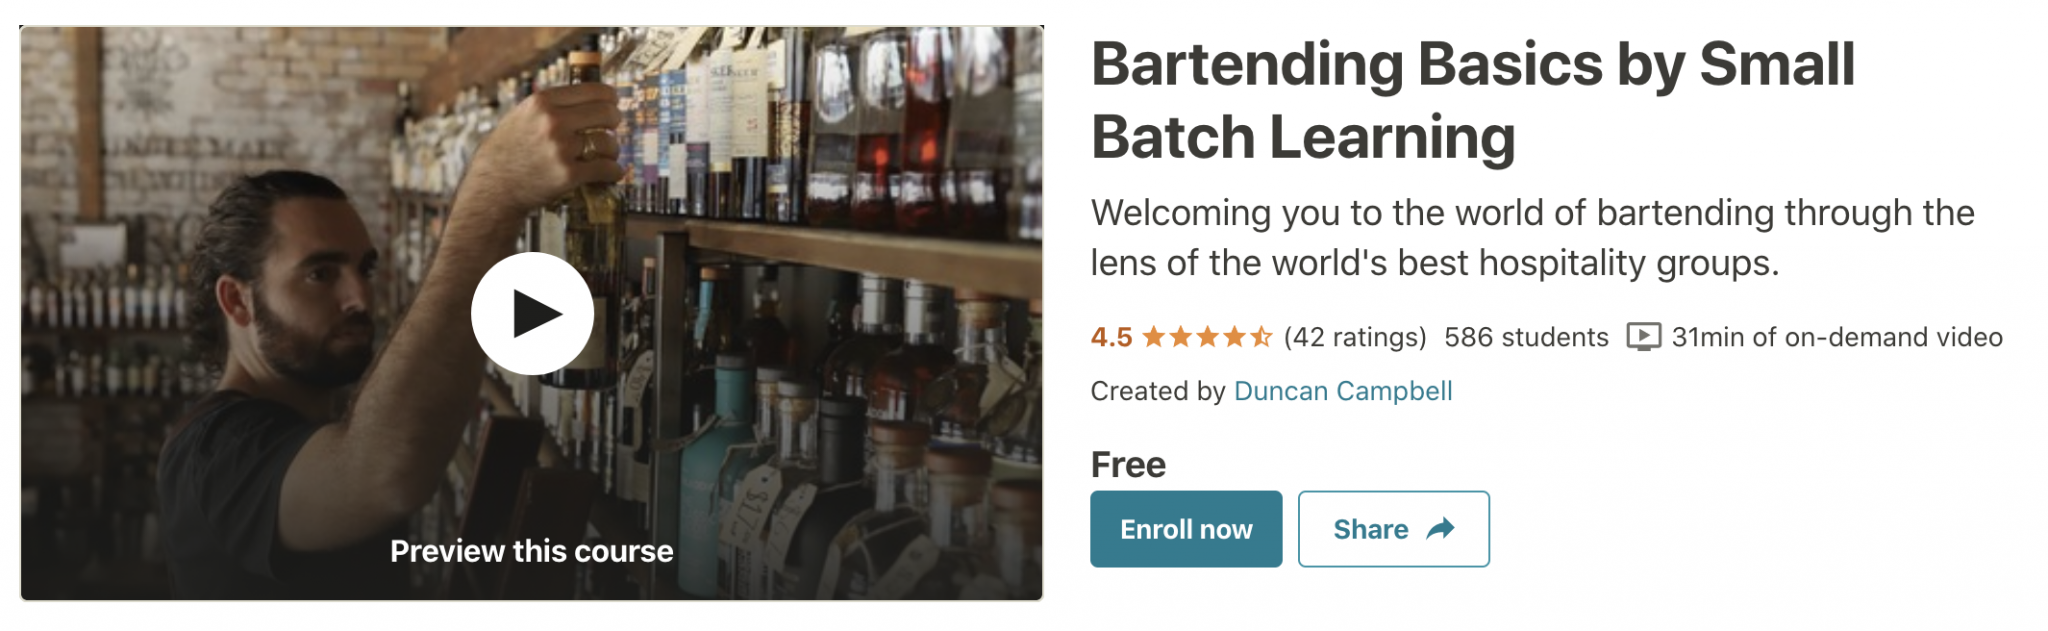 Bartending Training - Bartending Basics for Small Batch Learning (Udemy)